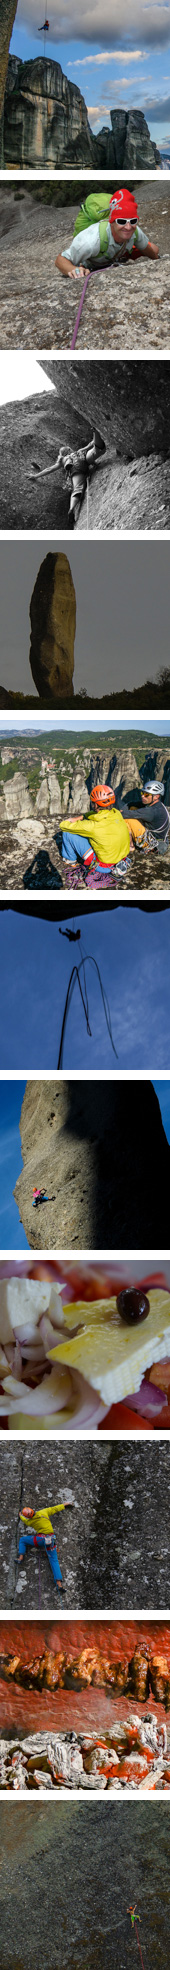 kalymnos guided rock climbing